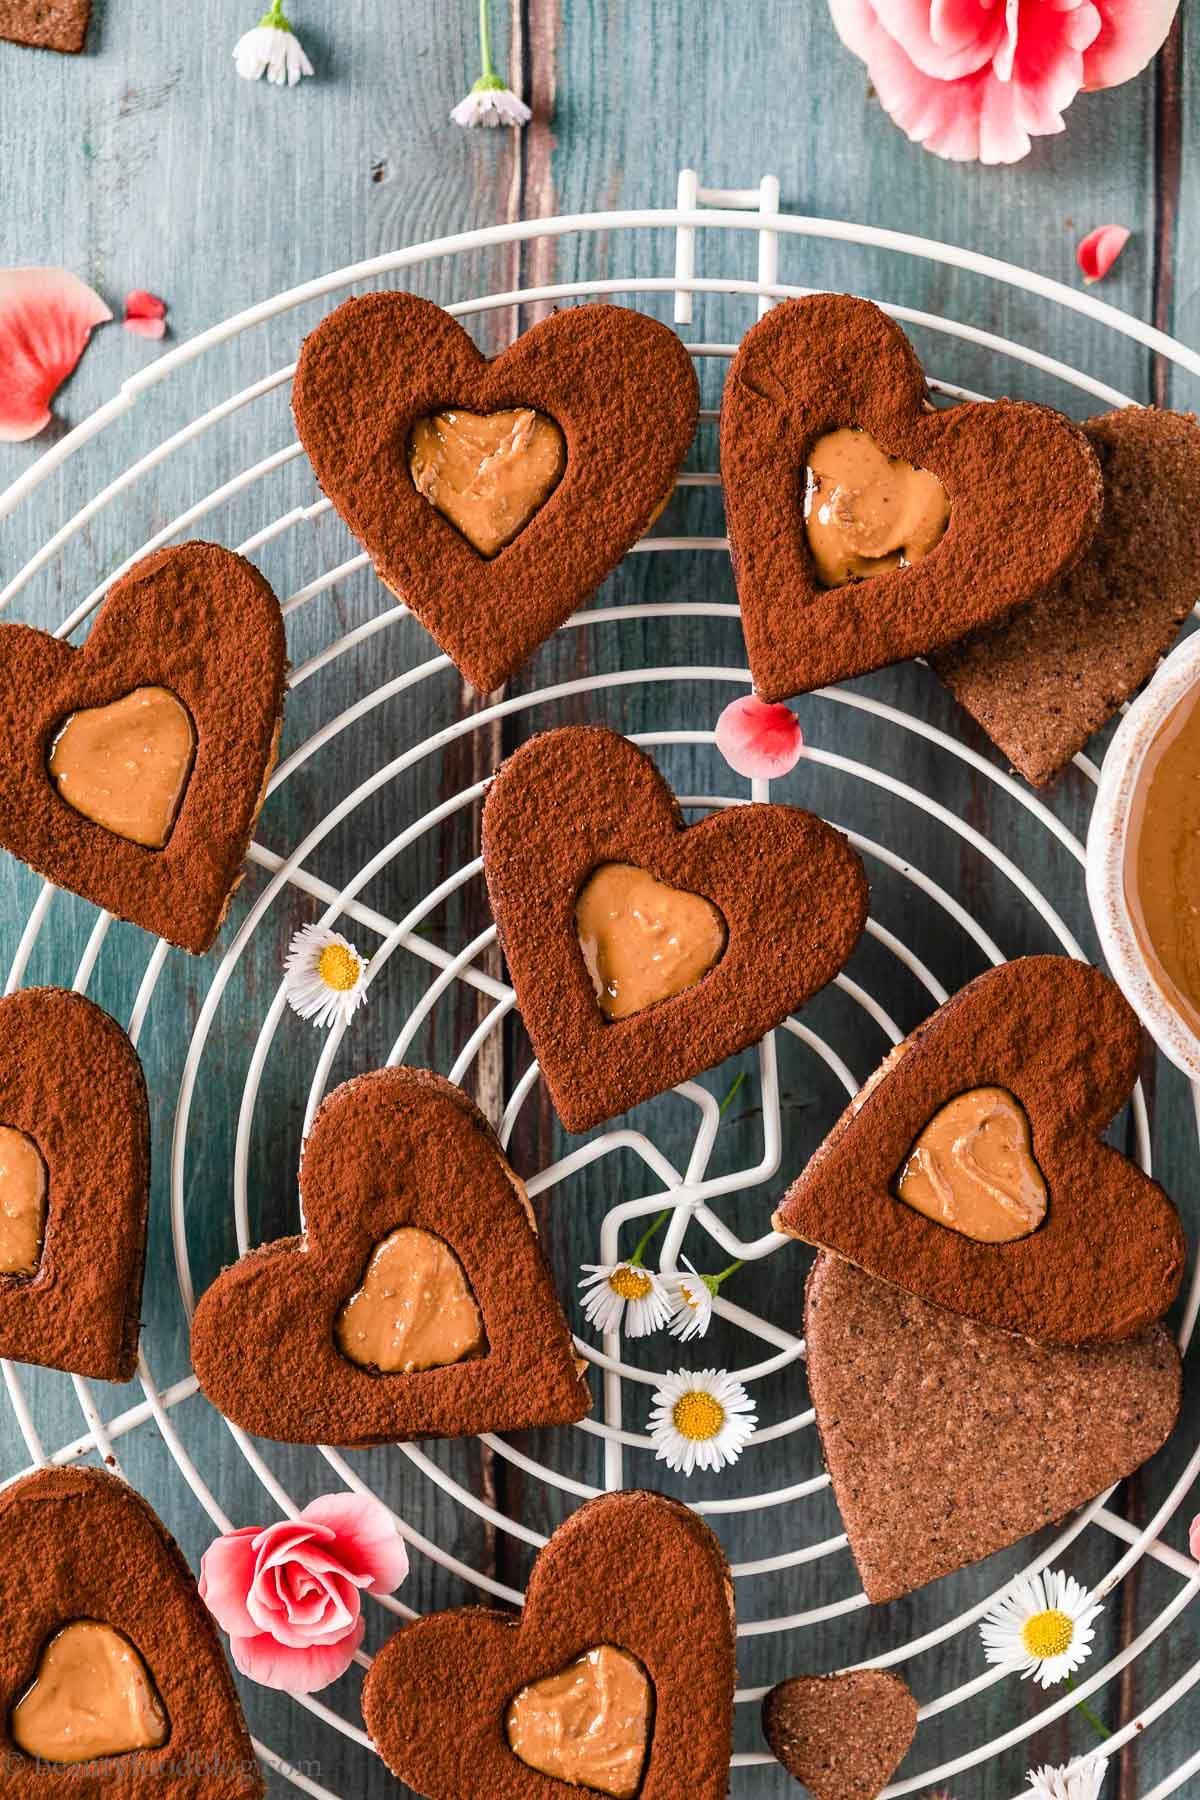 ricetta Frollini vegani senza glutine al cacao e caffè gluten-free vegan chocolate almond Linzer cookies valentines day